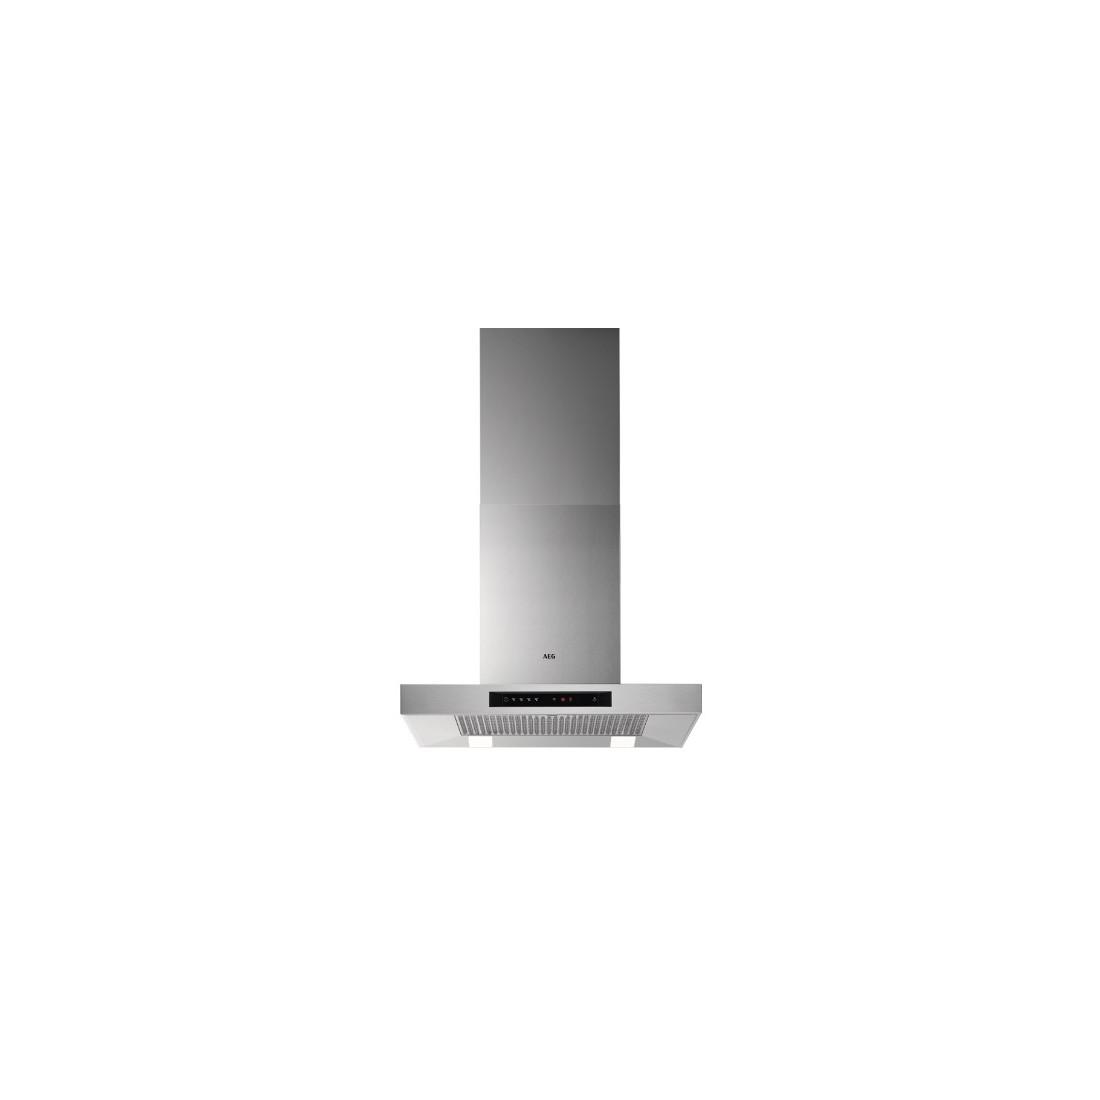 Campana Decorativa - AEG DBB5660HM, Eficiencia A, Acero Inoxidable, T-Invertida, Hob2Hood